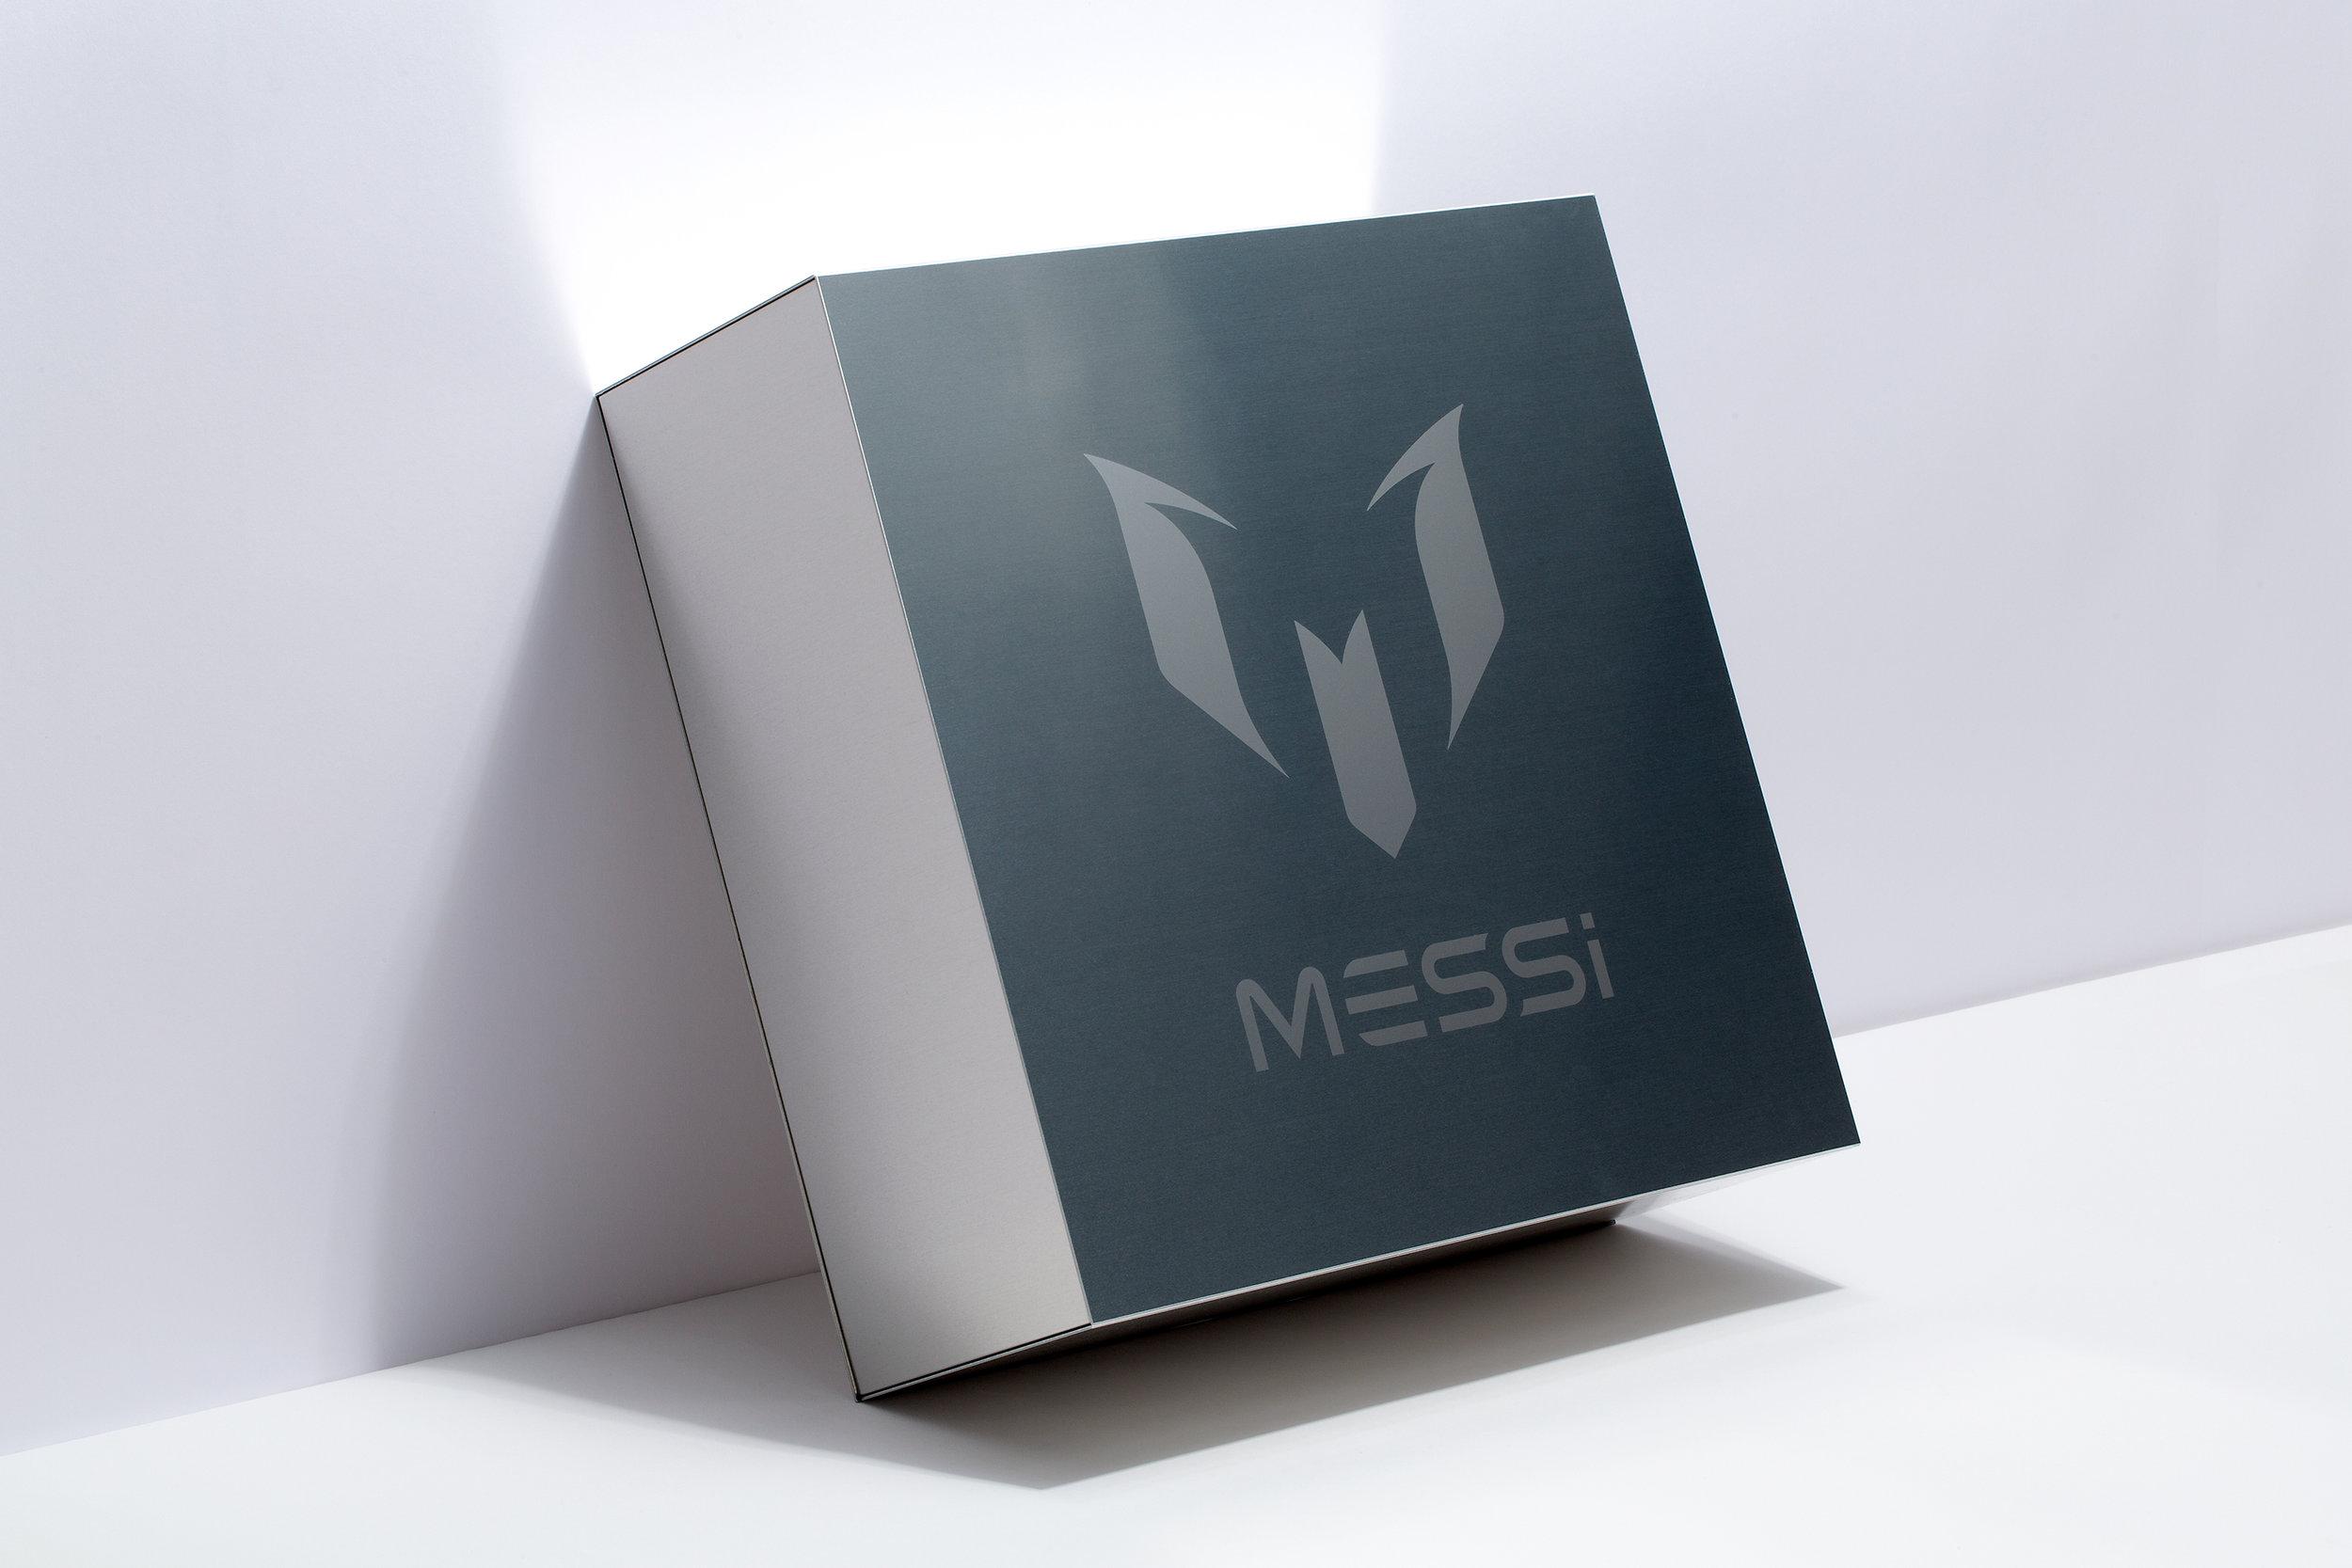 adidas_Messi_box_1.jpg